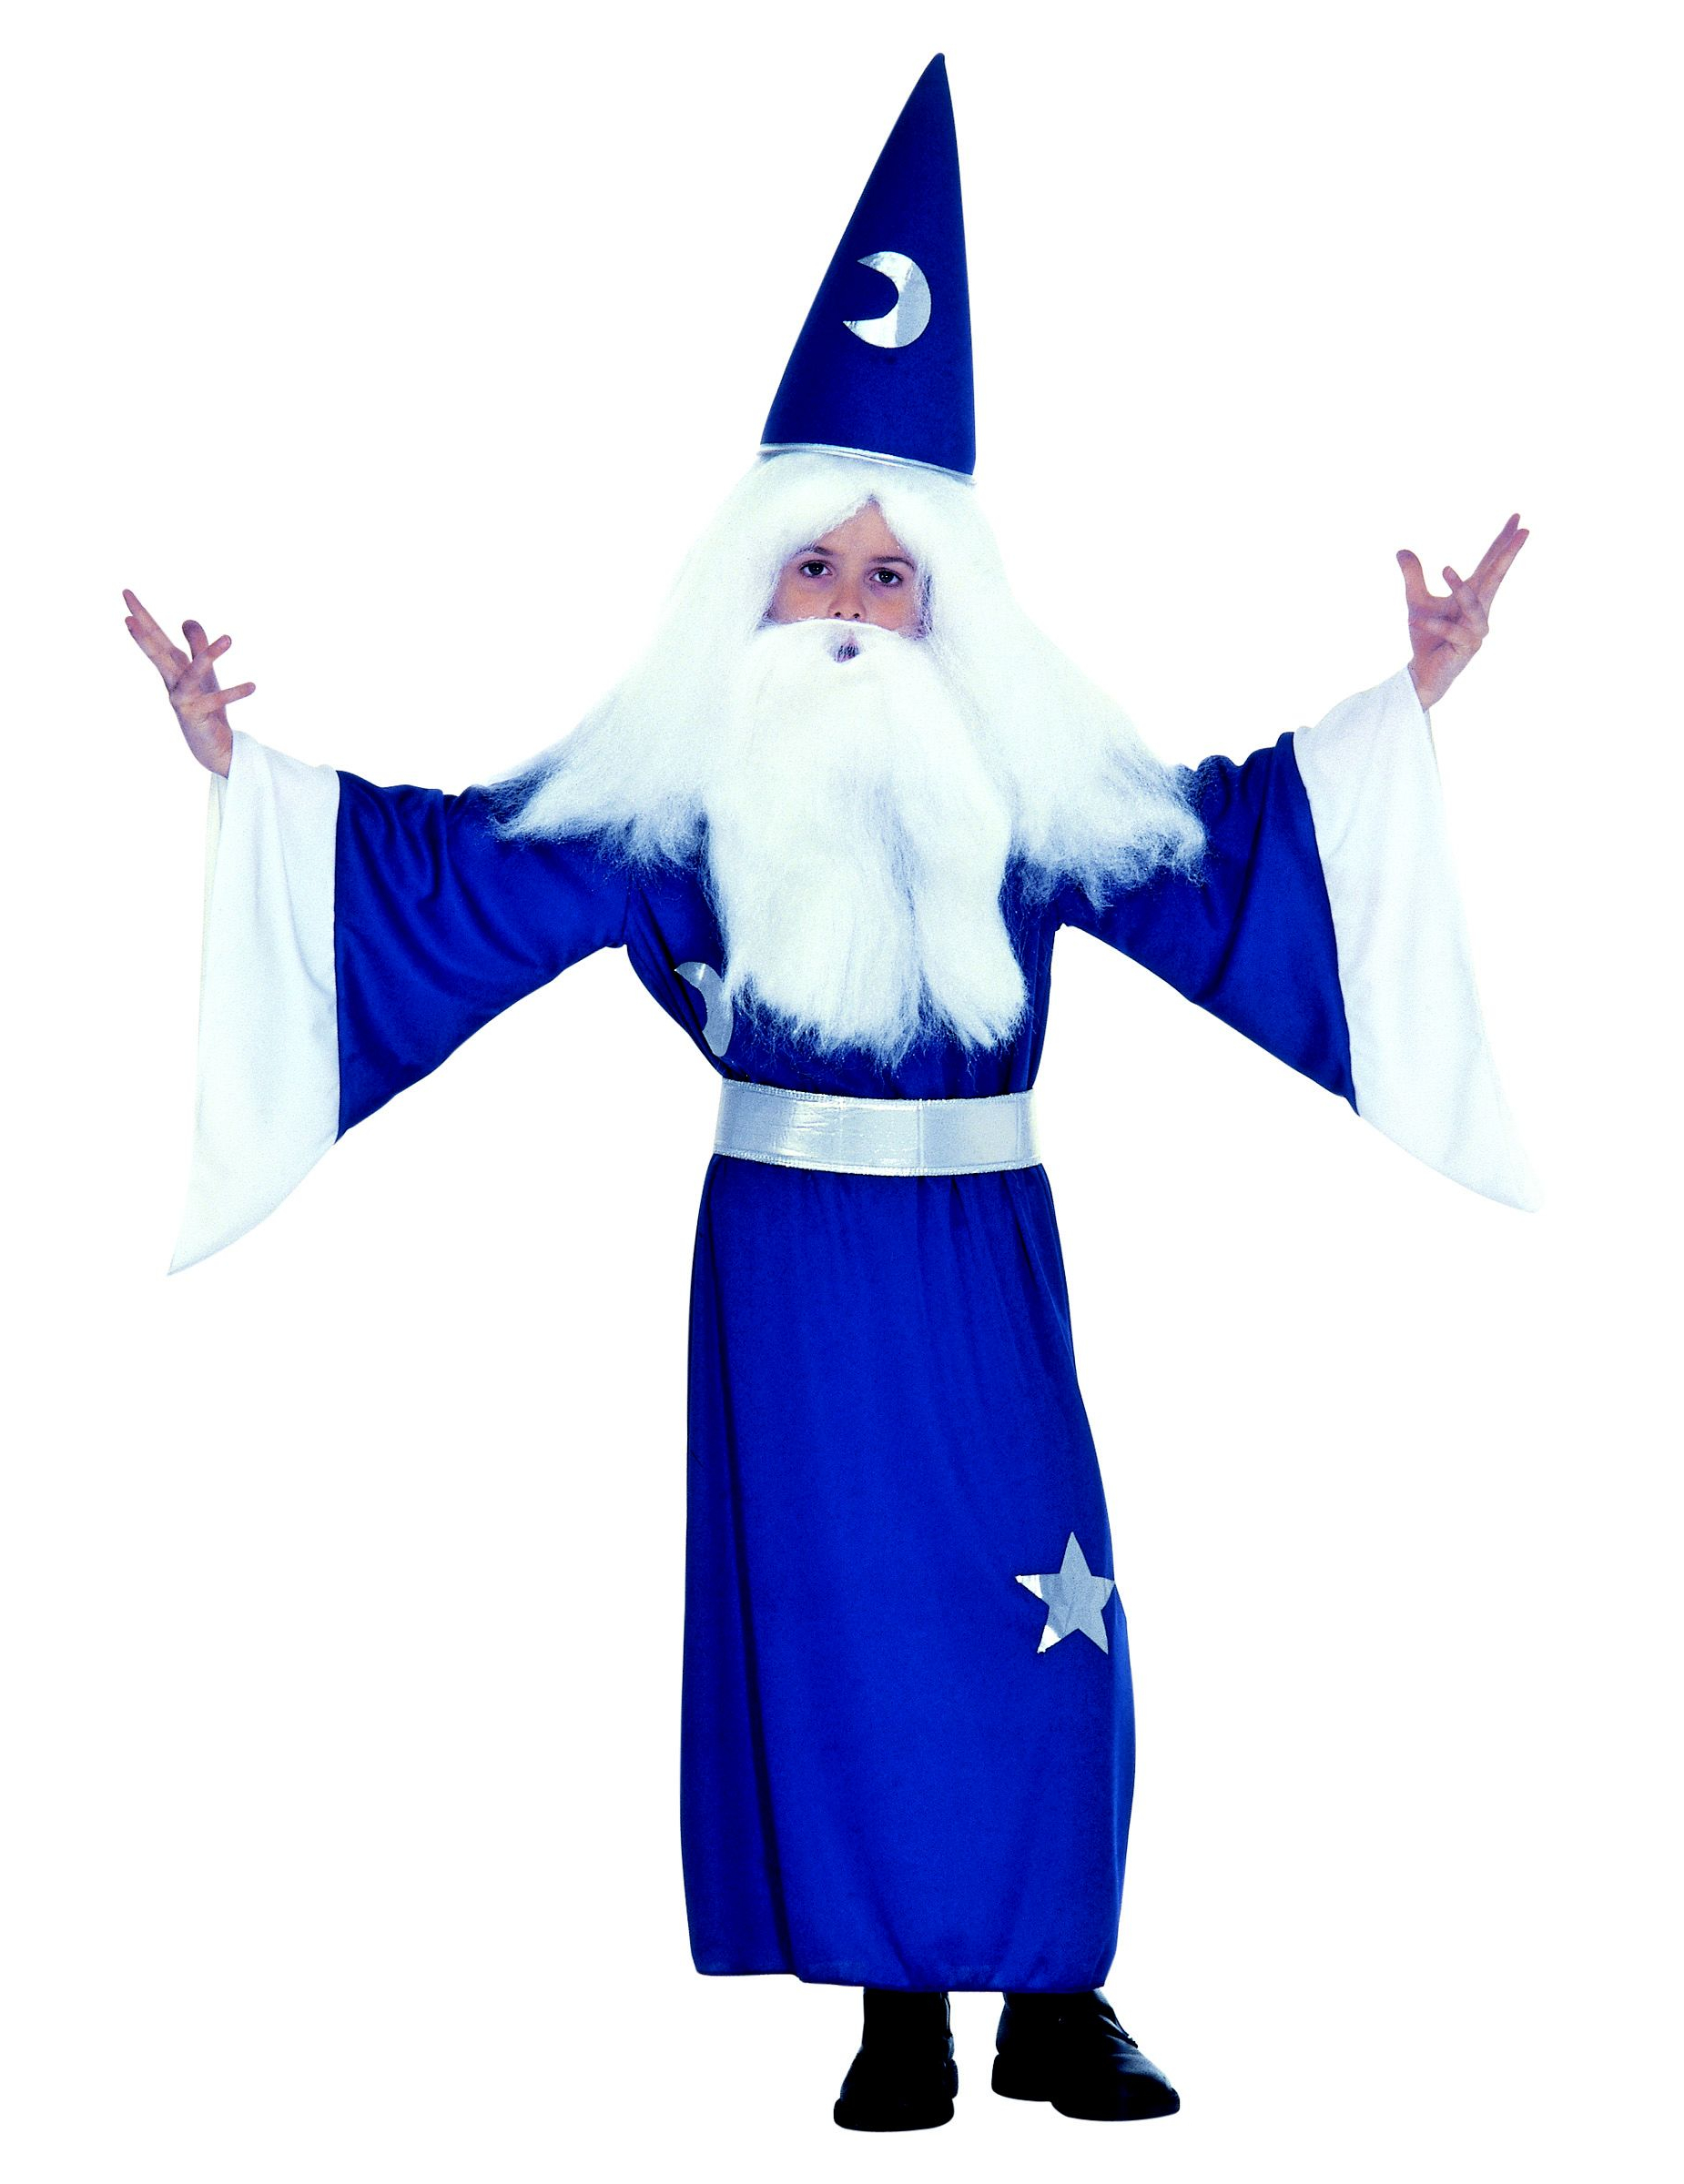 Magierkostum Fur Kinder Zauberer Kinderkostum Blau Silber Gunstige